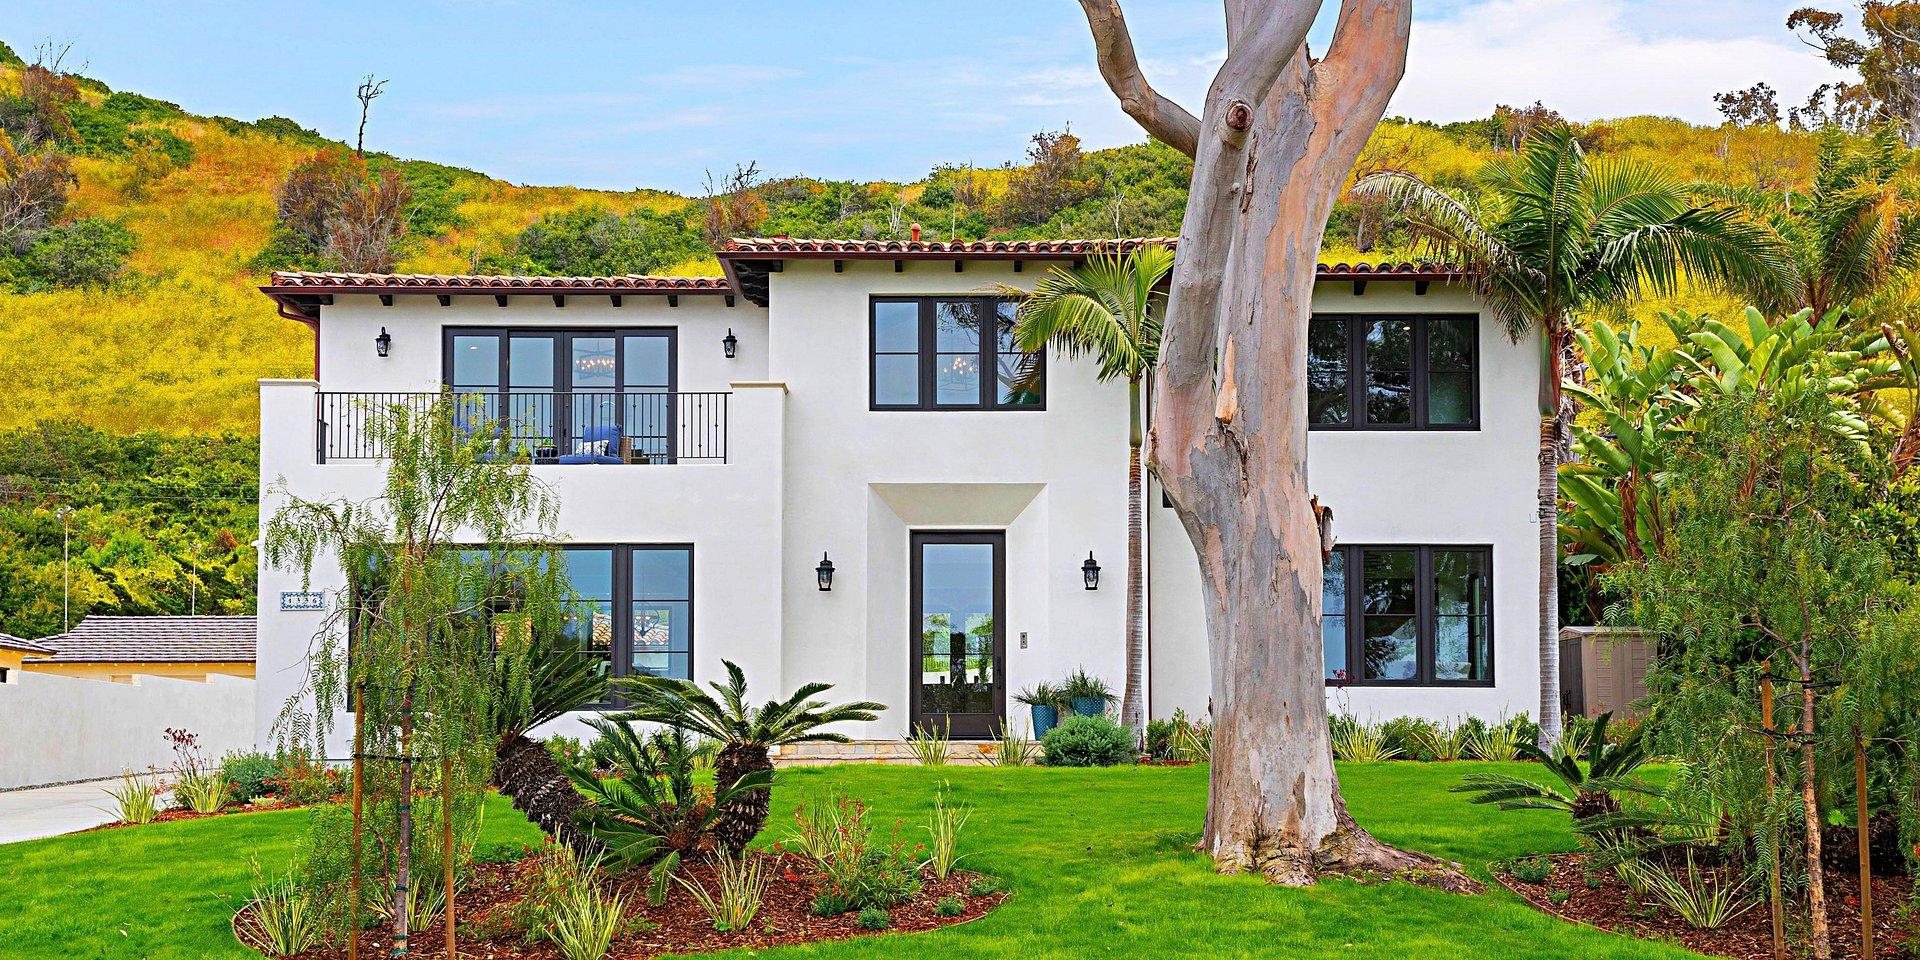 Coldwell Banker Residential Brokerage Lists New Palos Verdes Estates Property for $3.75 Million